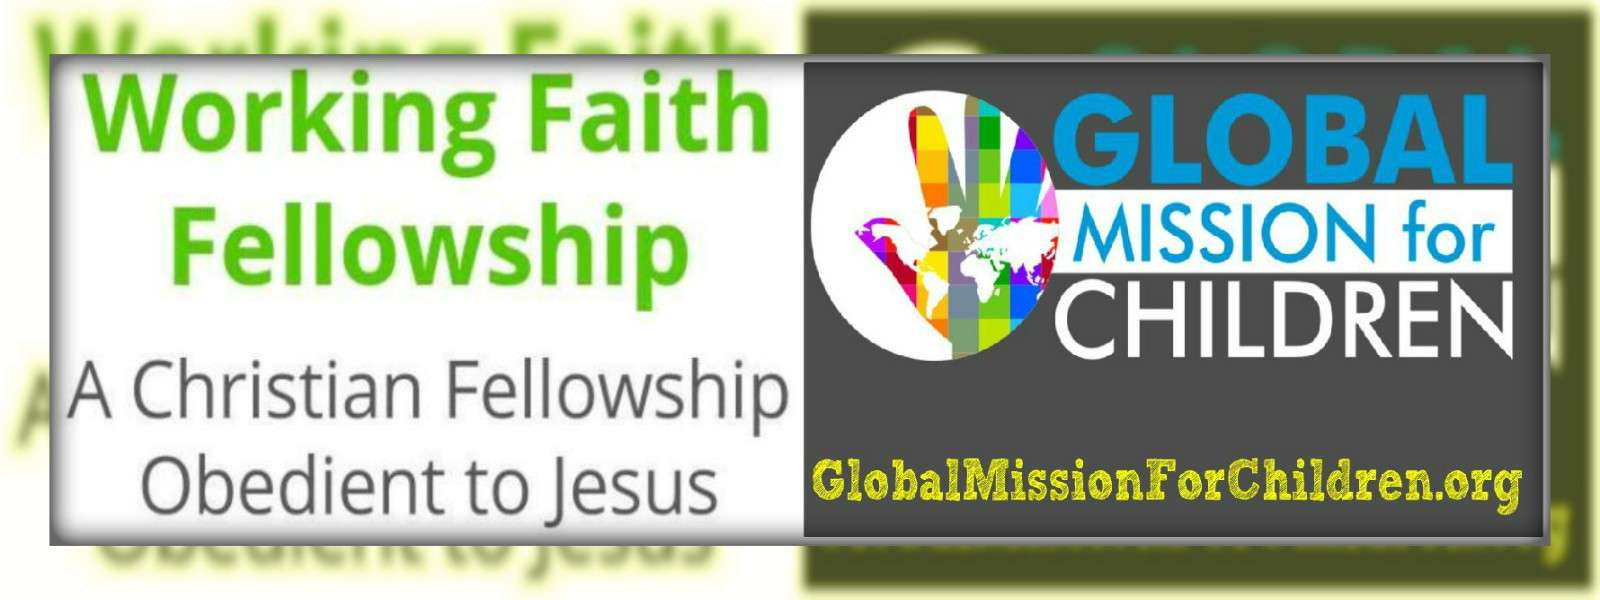 Working Faith Fellowship Church USA